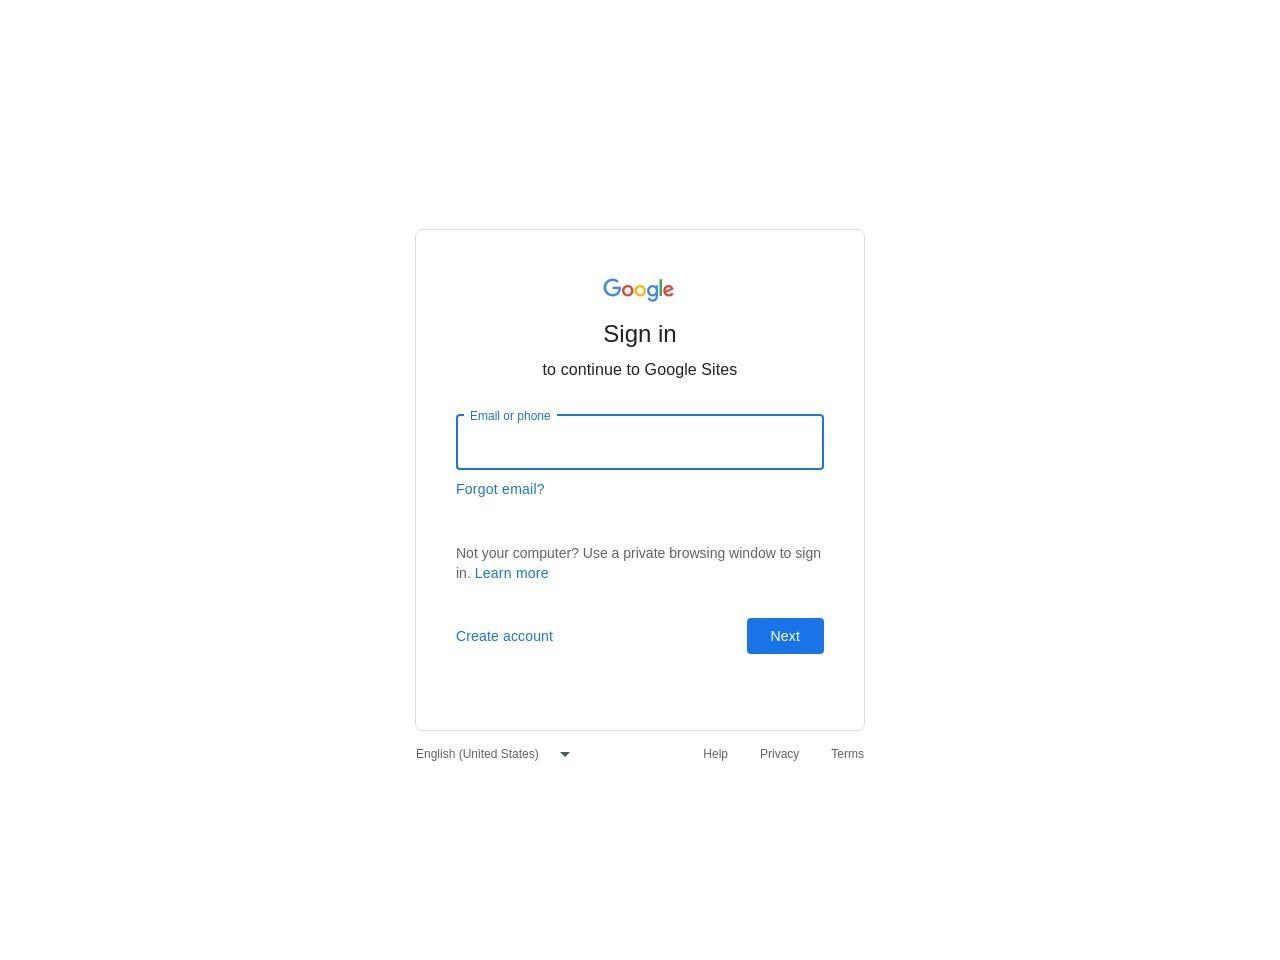 Amazon.com/code Almost every person